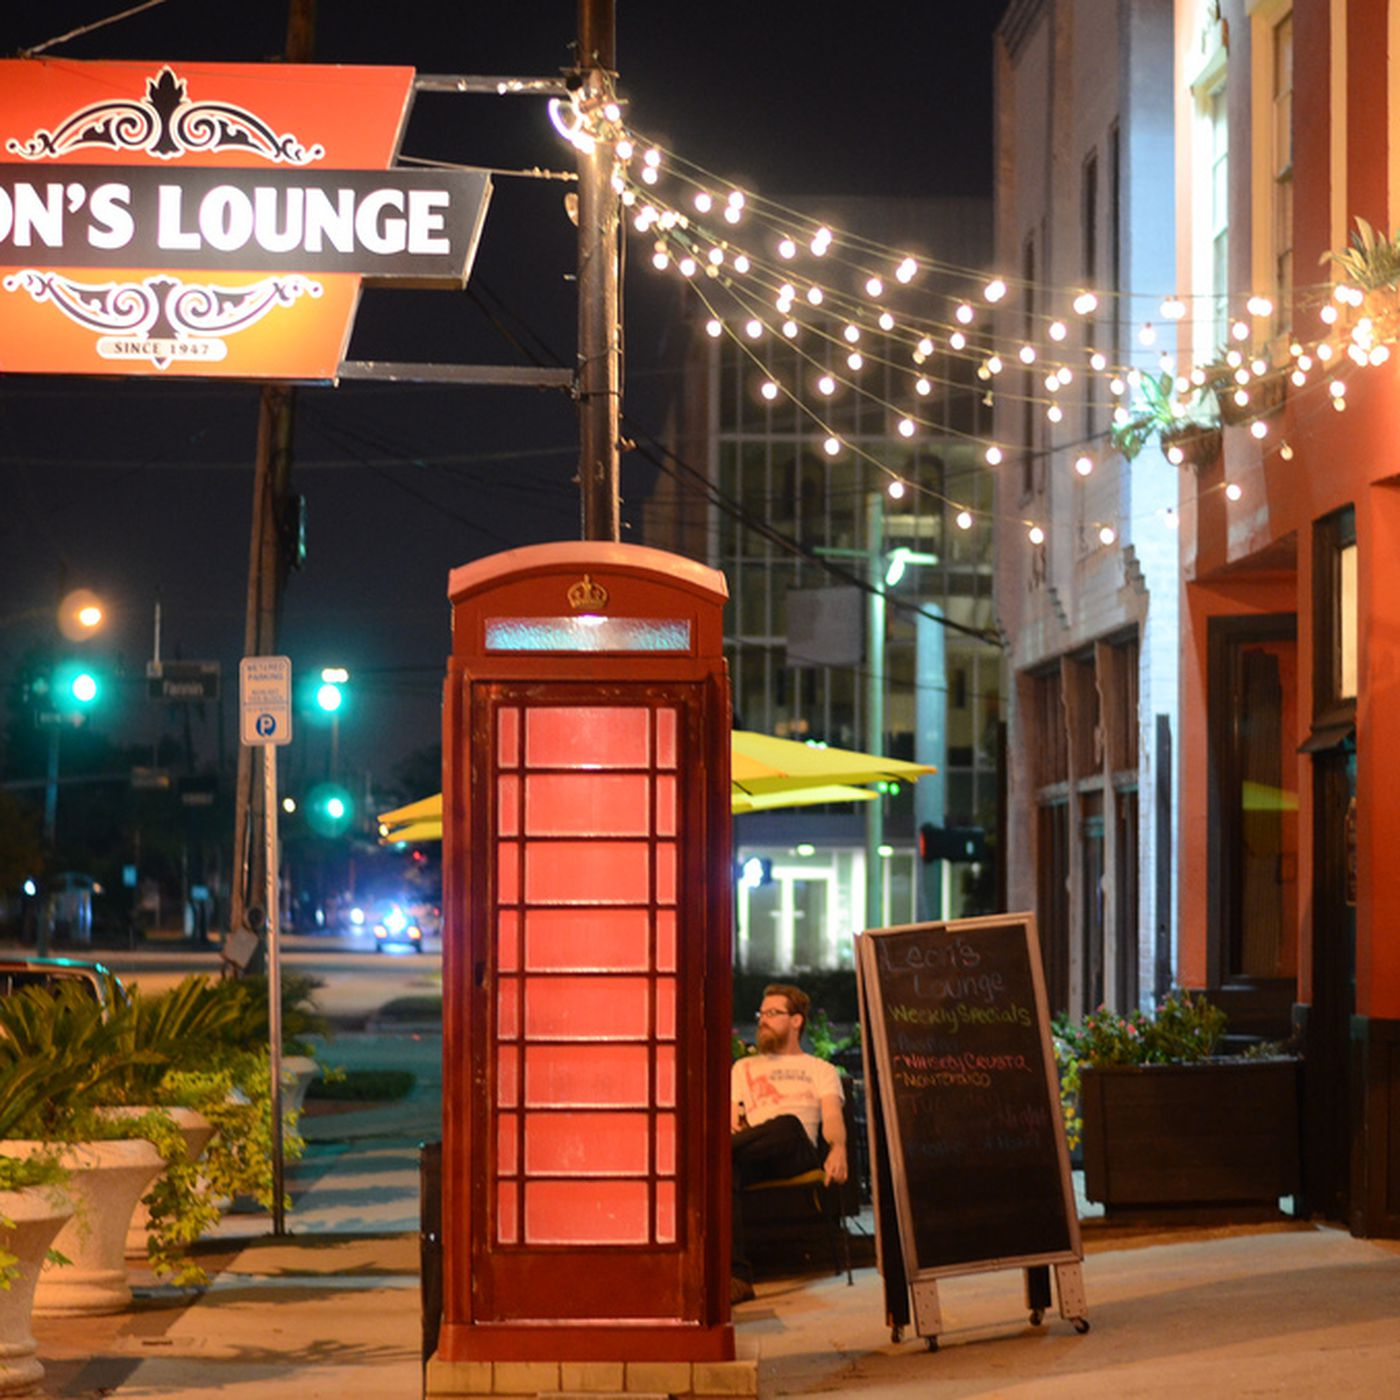 Leons Lounge Houstons Oldest Bar Unexpectedly Shutters Eater